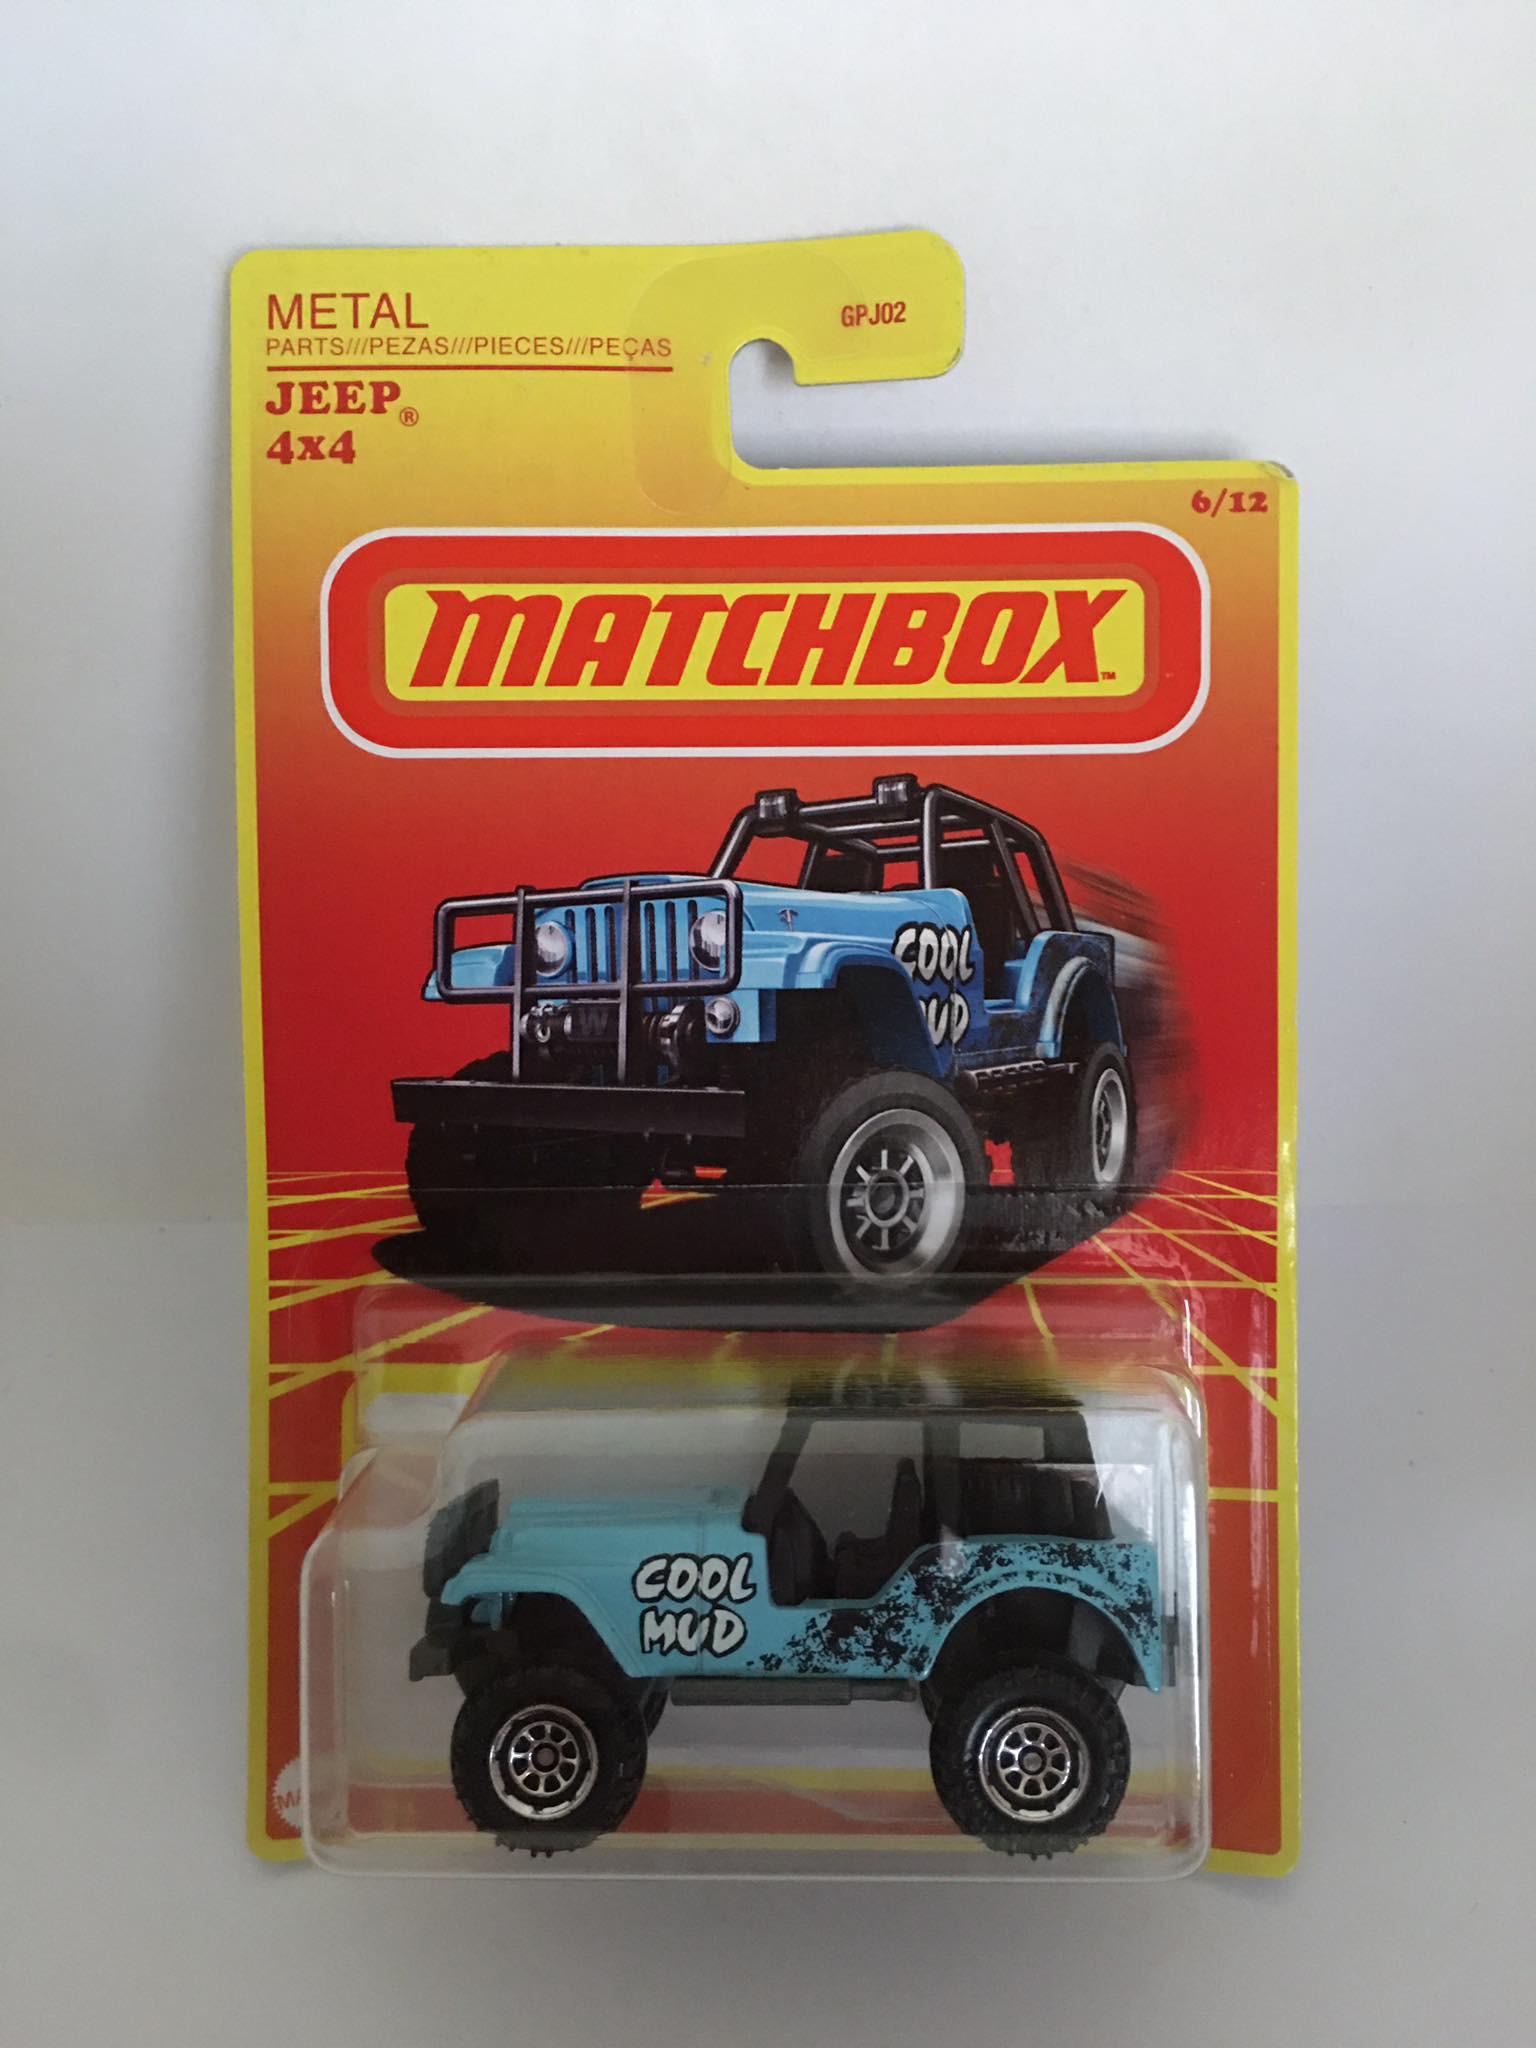 Matchbox - Jeep 4x4 Azul - Retro Series - Exclusivo Target